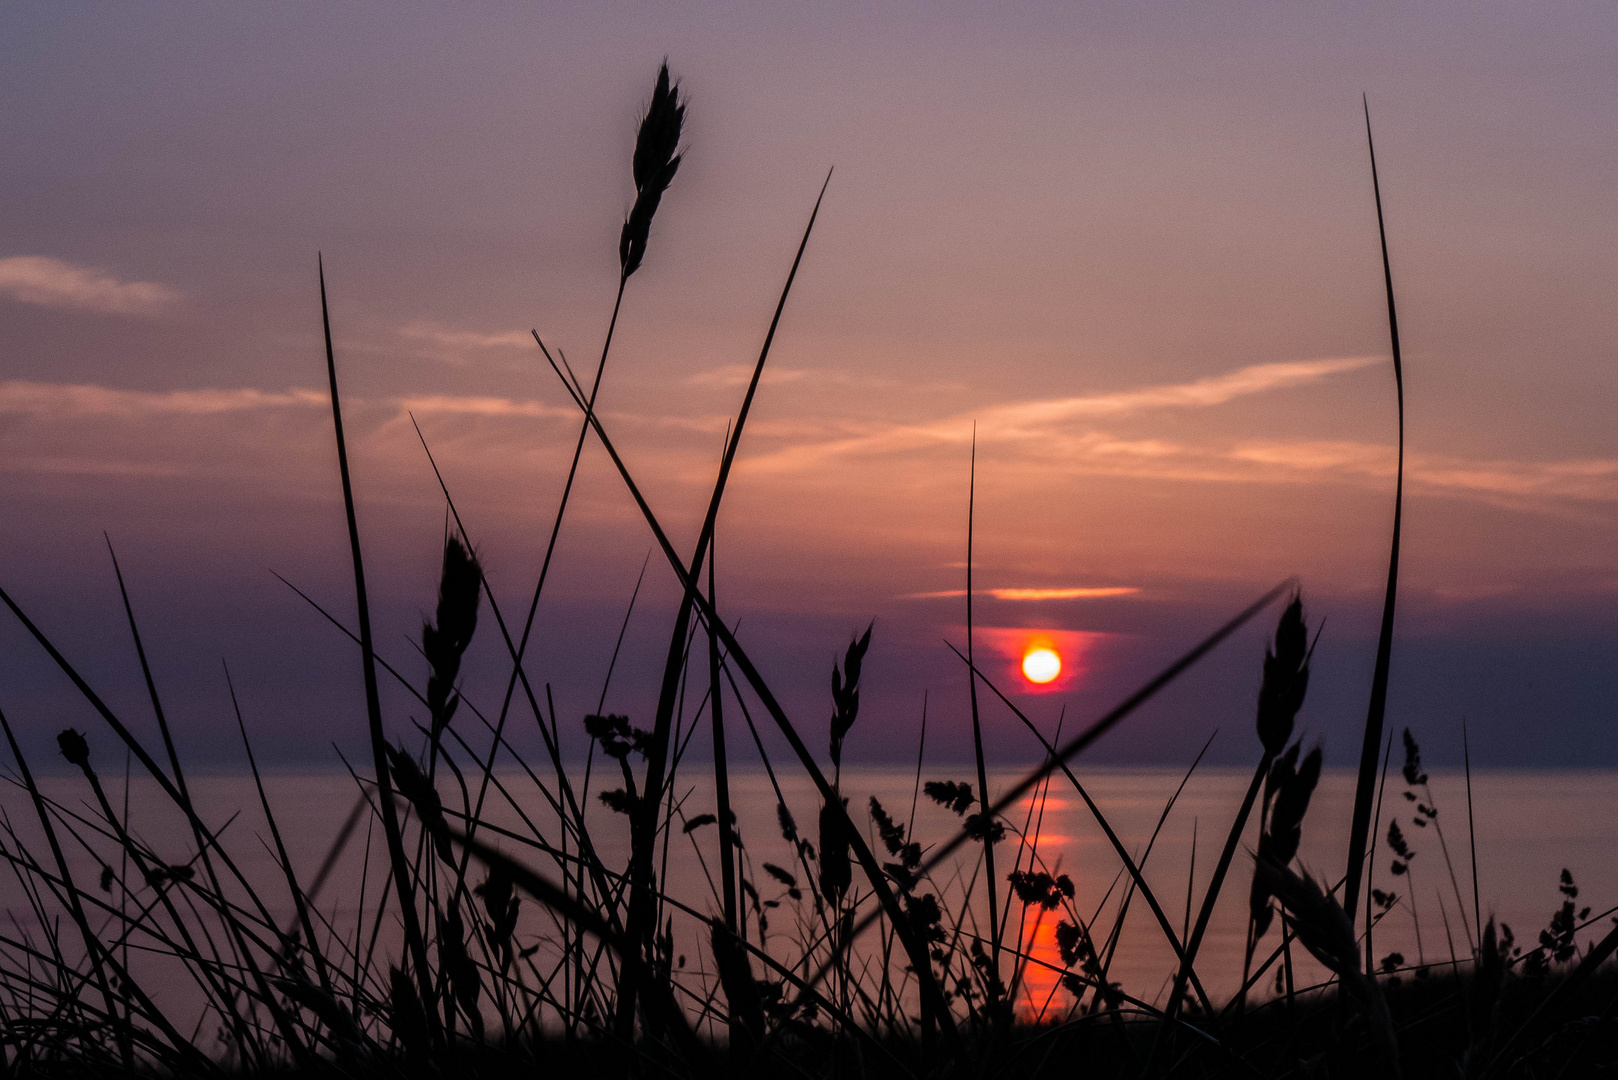 Sonnenuntergang in Rantum